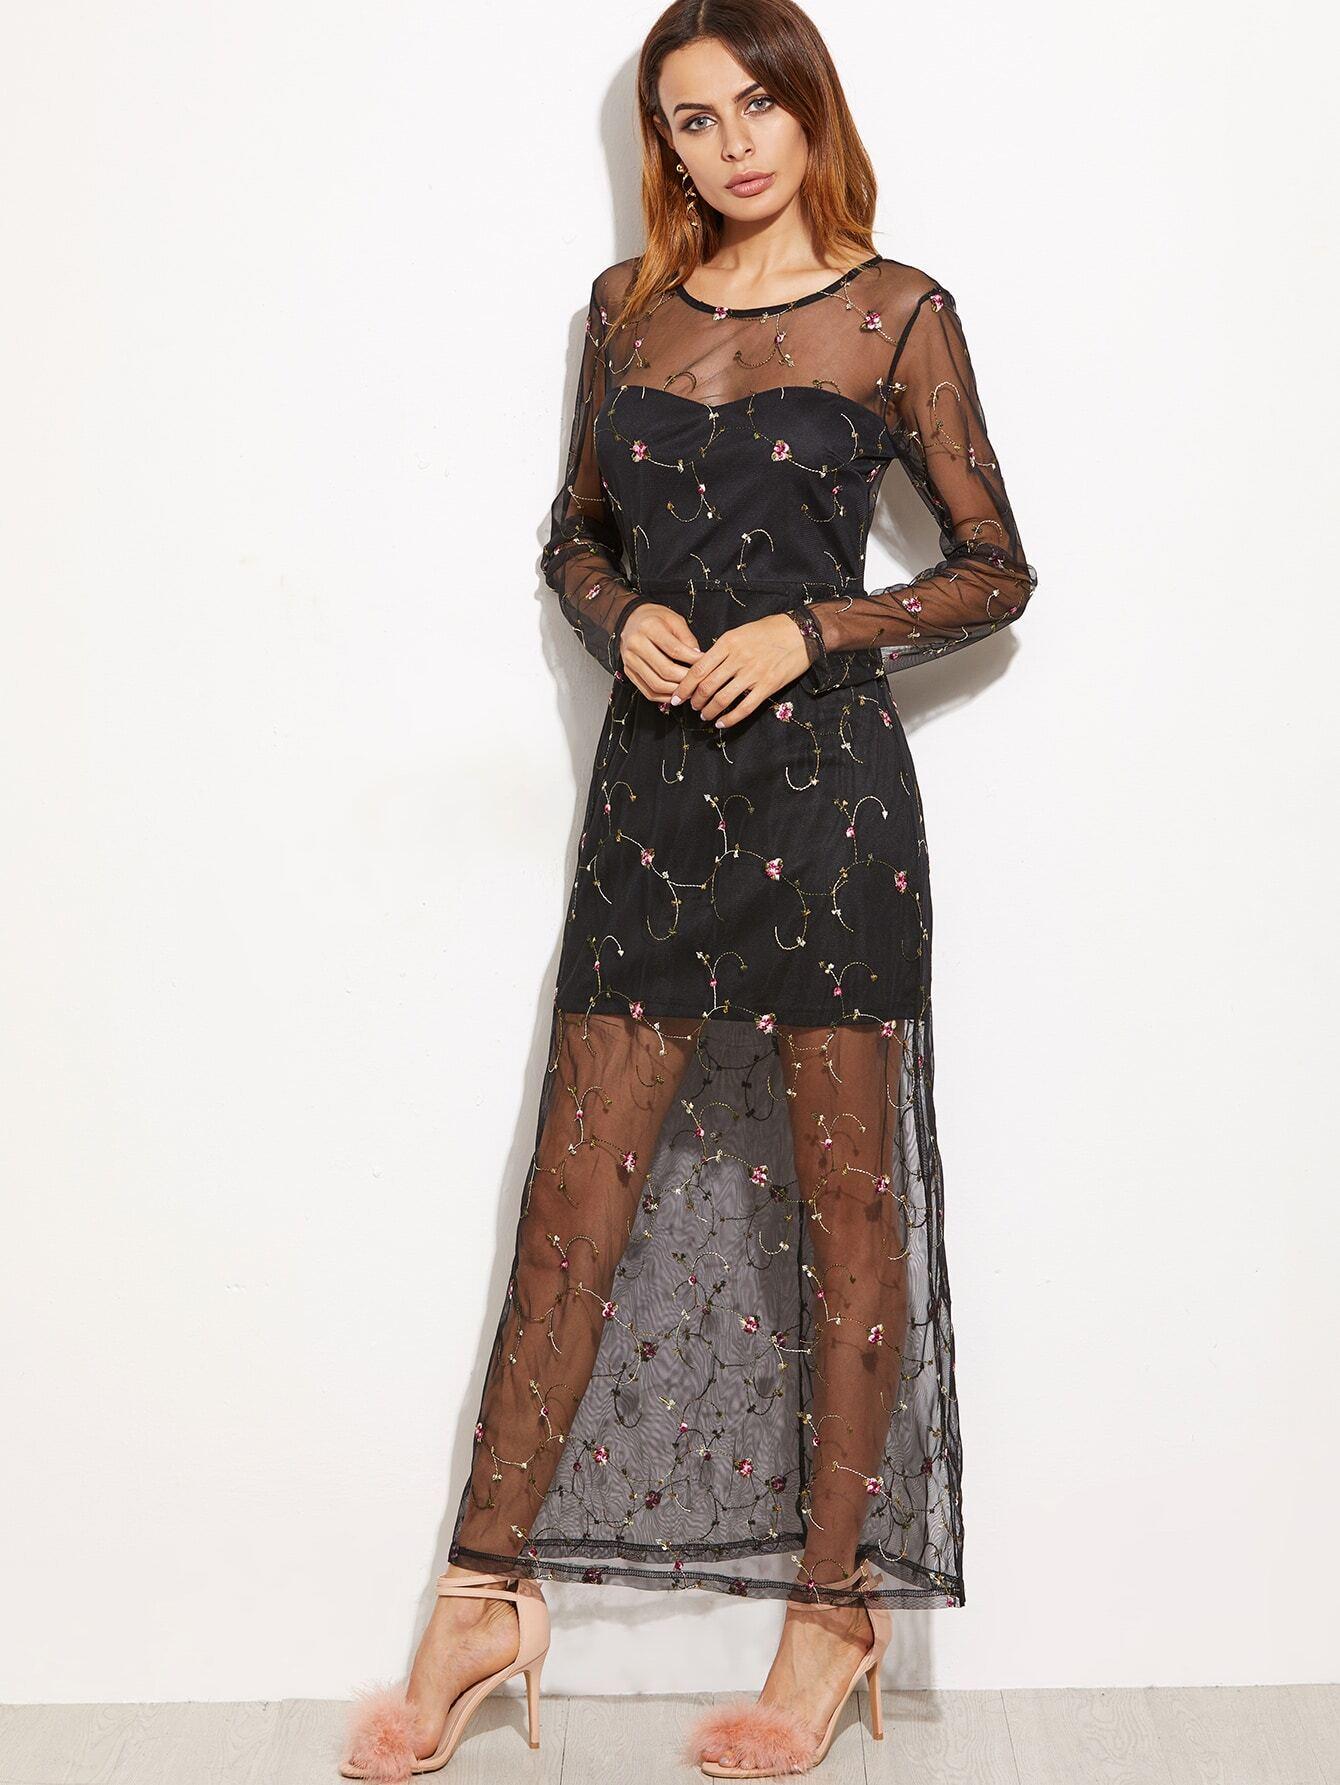 Black Sheer Mesh Embroidered Dress Shein Sheinside